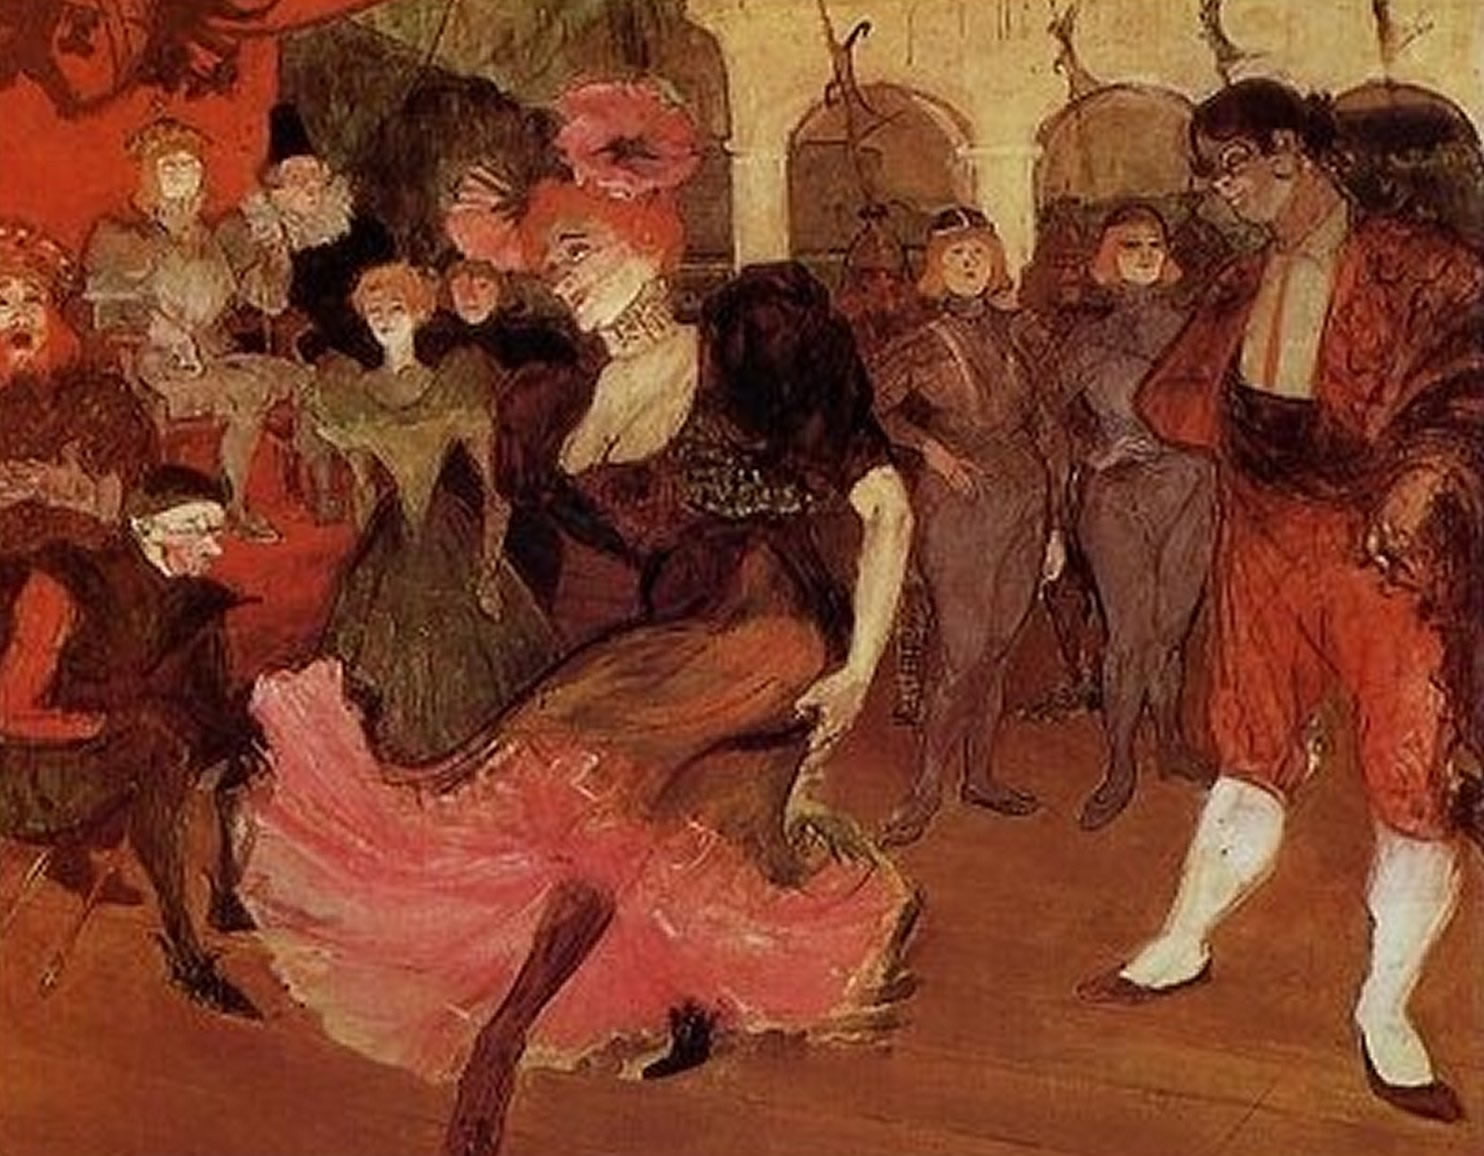 Prestamista de Marcelle bailando bolero en Chilperico